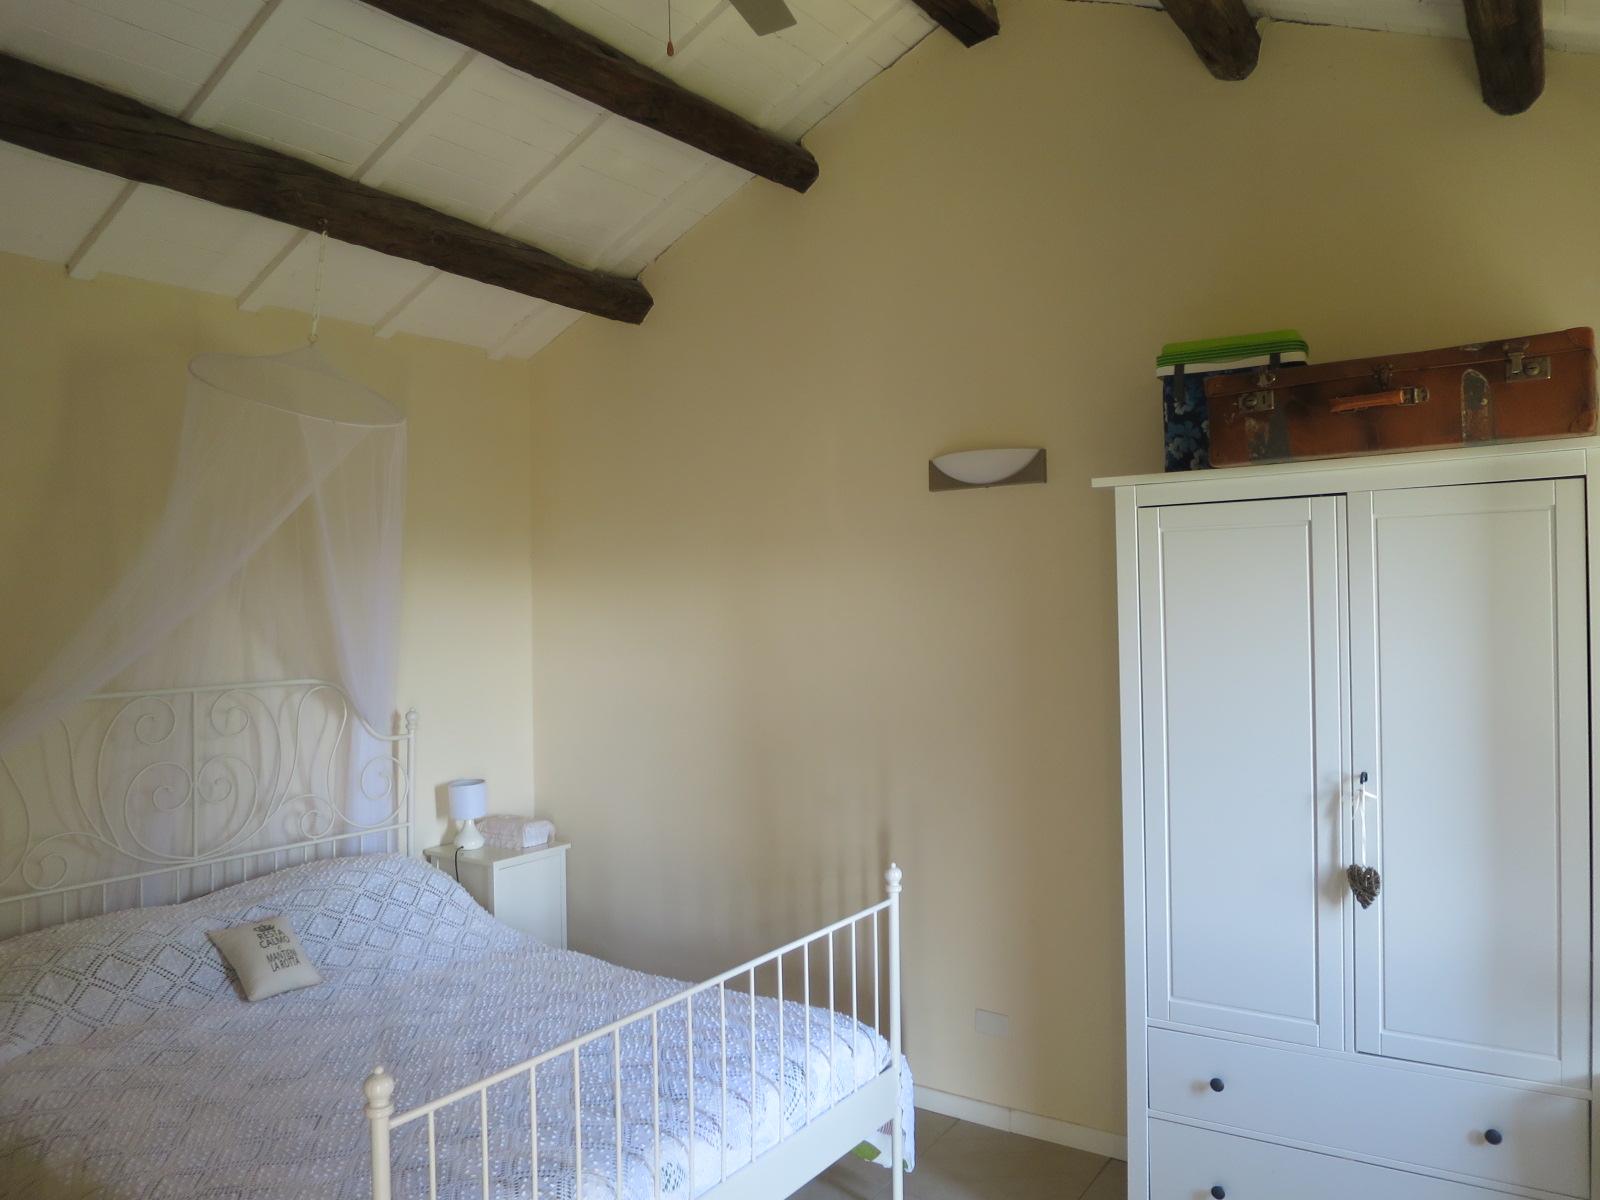 Country Houses Country Houses for sale Montefino (TE), Casa Collina - Montefino - EUR 151.447 360